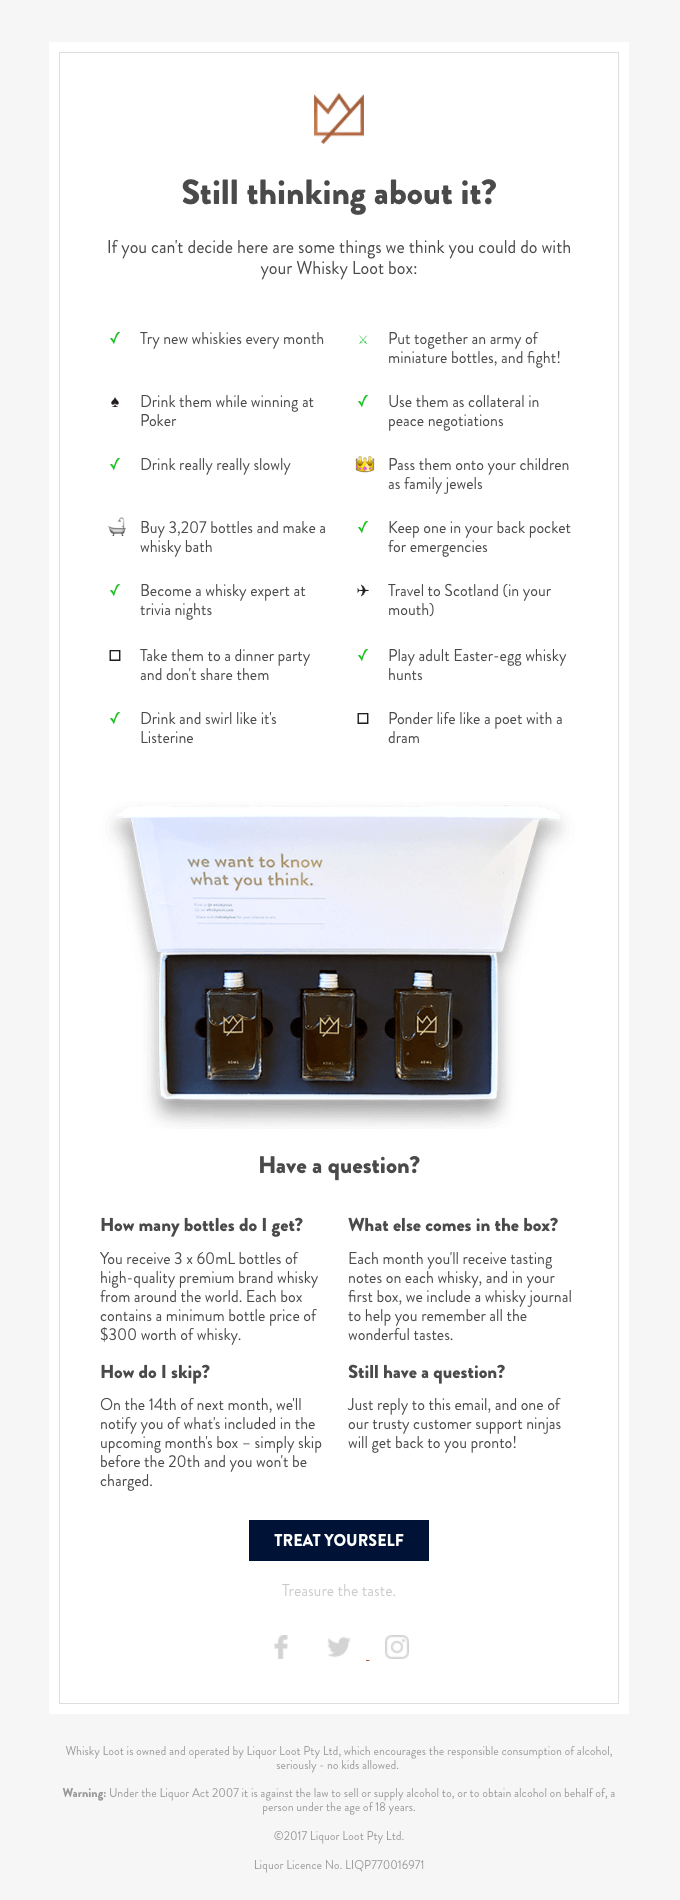 Screenshot showing a reminder email